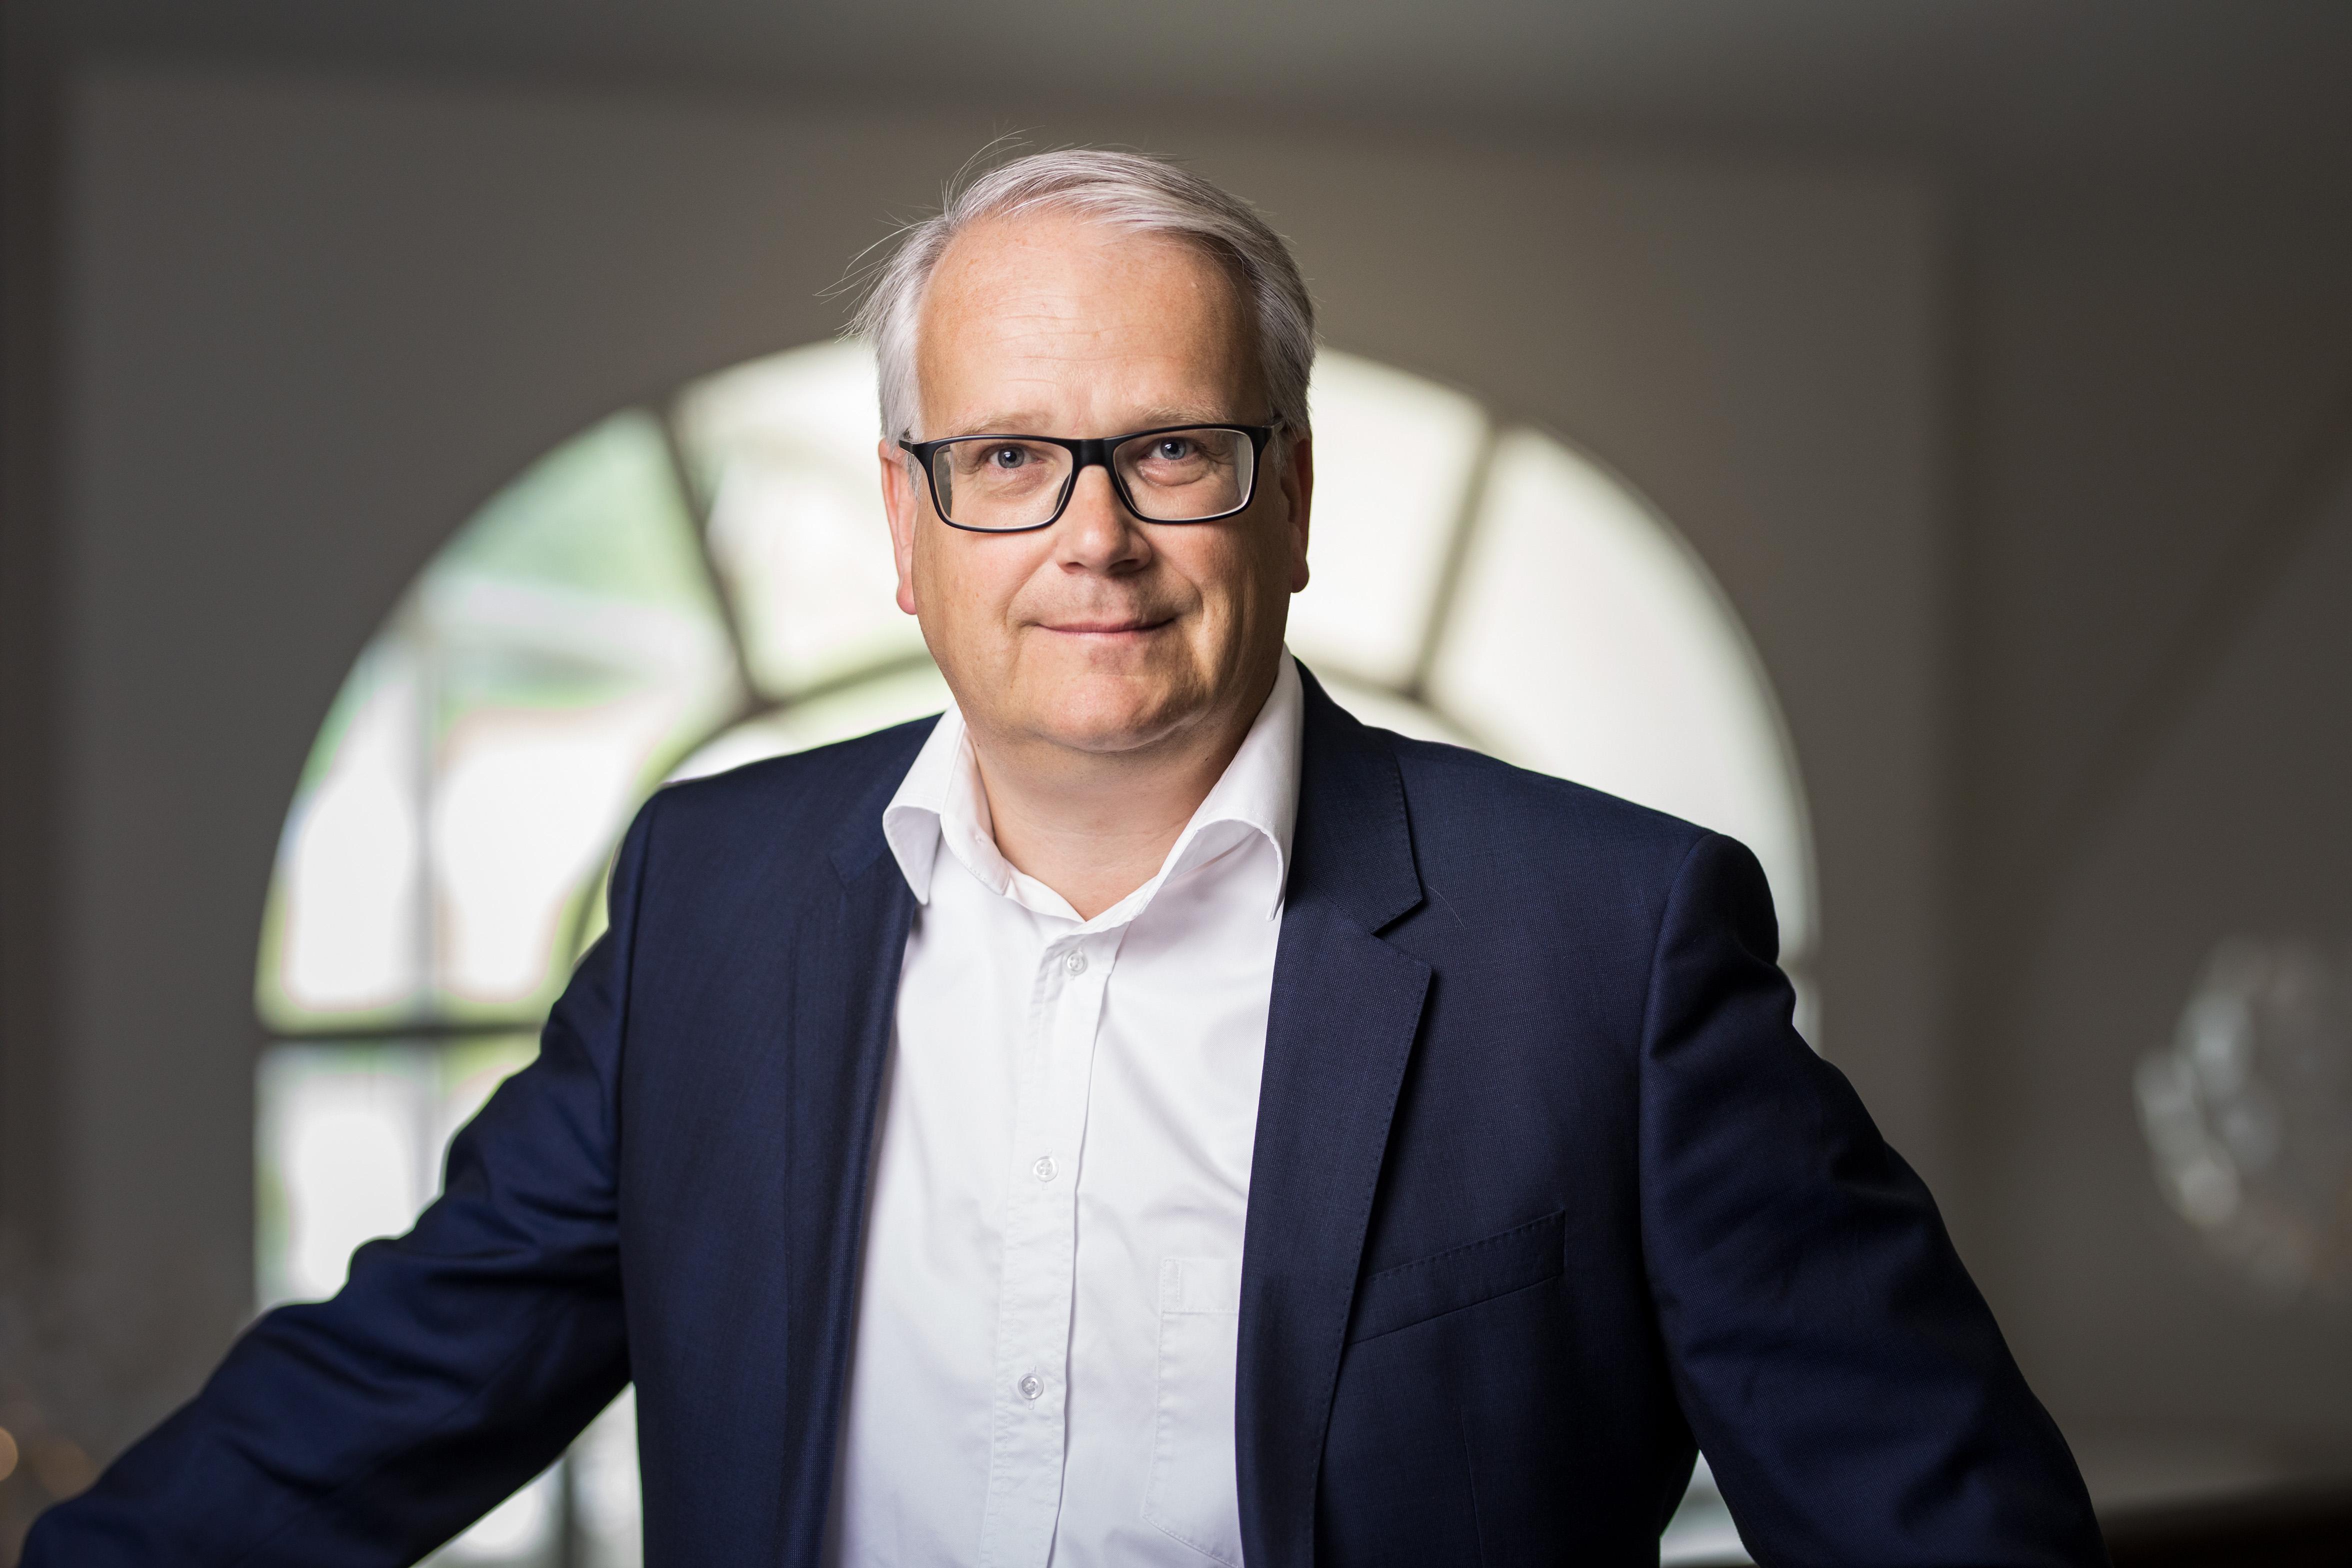 Magnus Ohlsson vd Cementa, Cementa's CEO